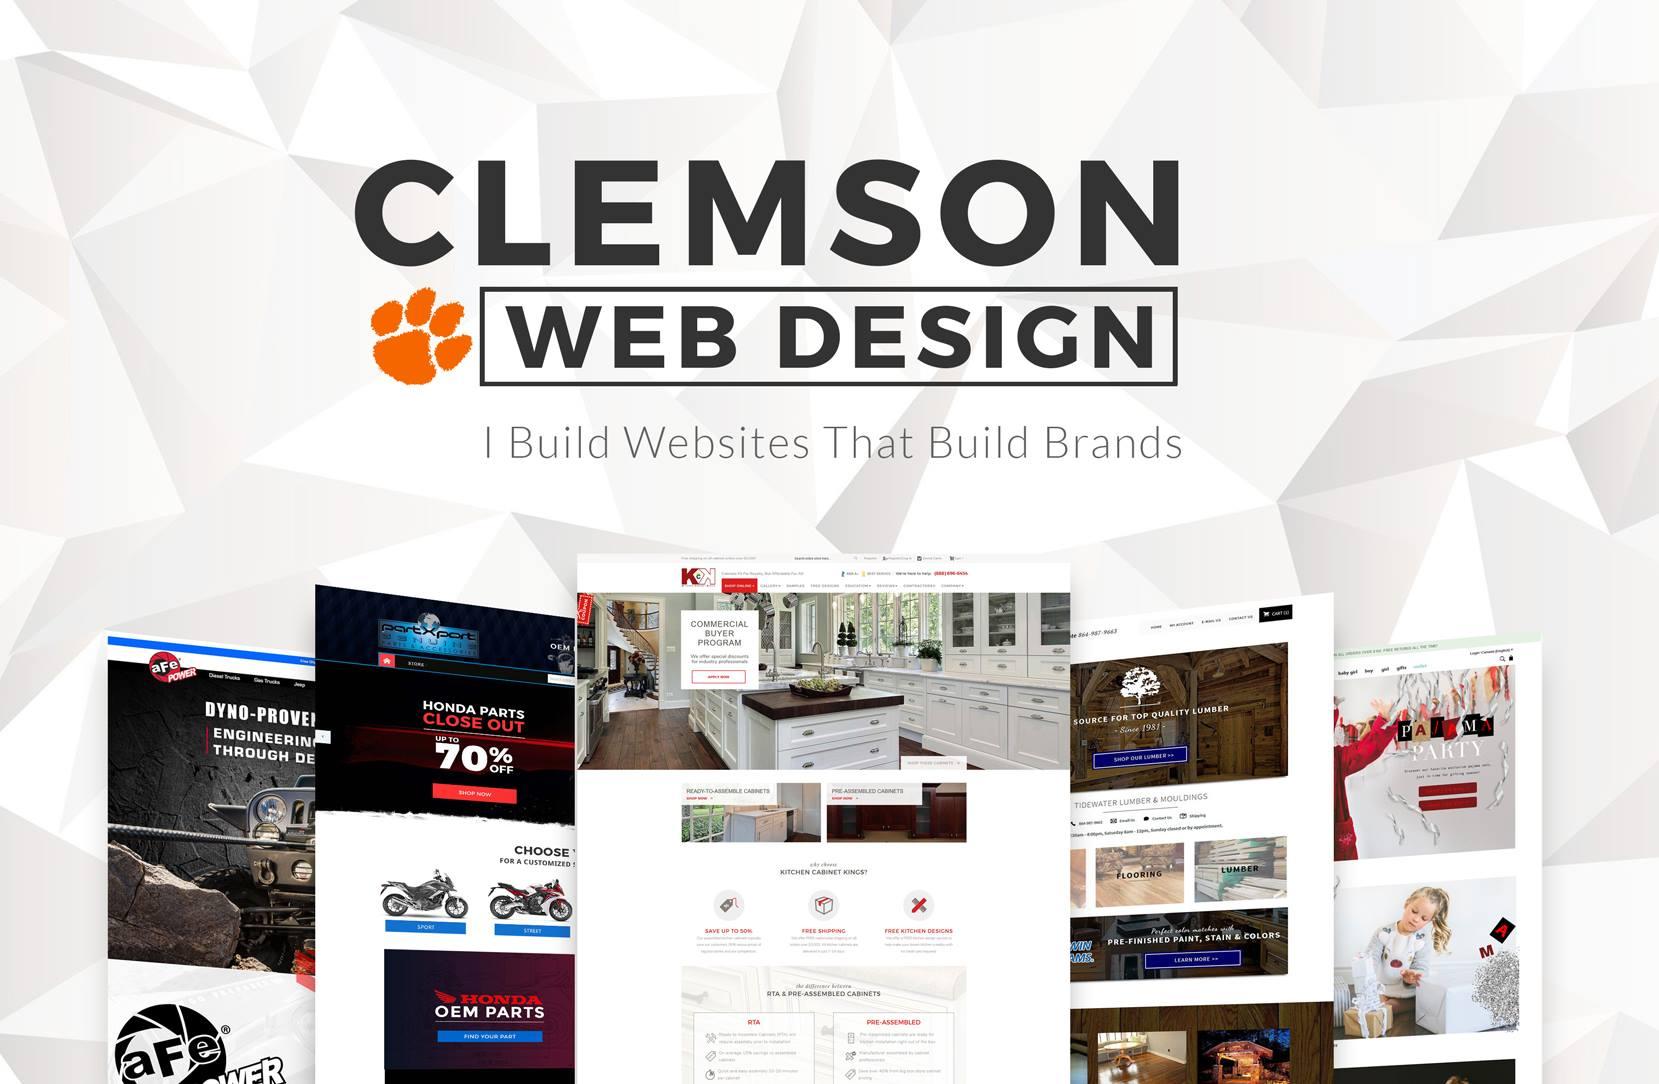 Greenville Clemson Anderson Web Designer